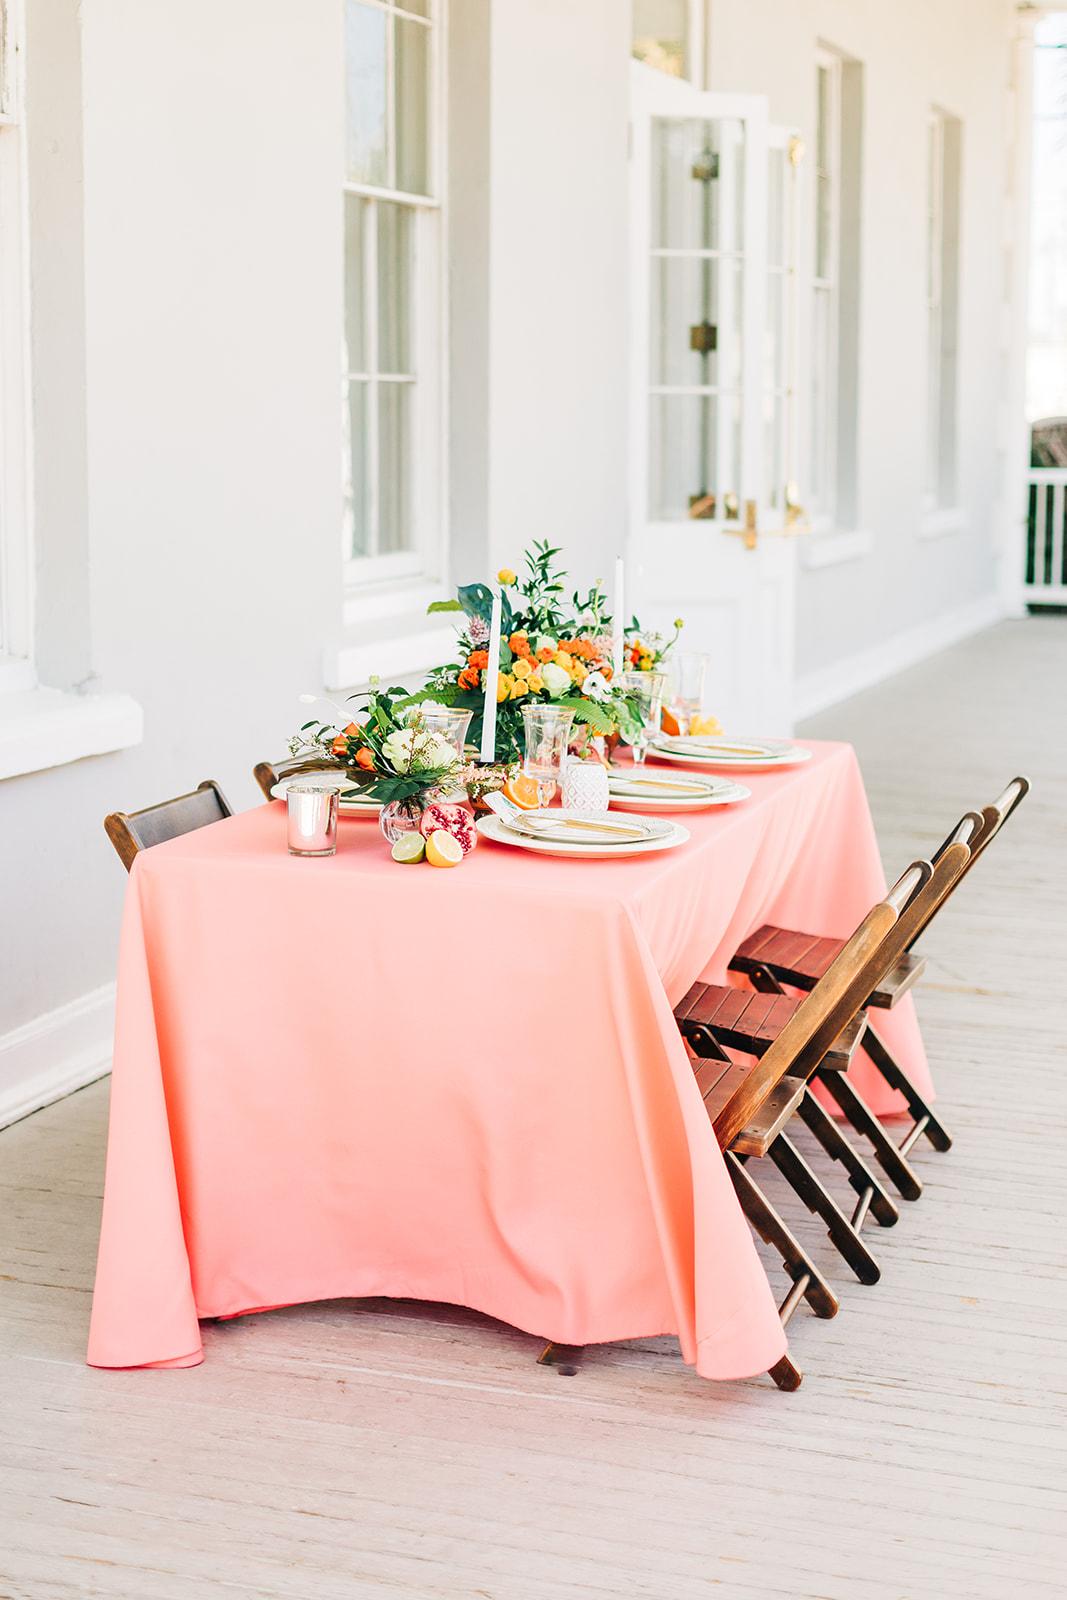 gadsden-house-wedding-29.jpg